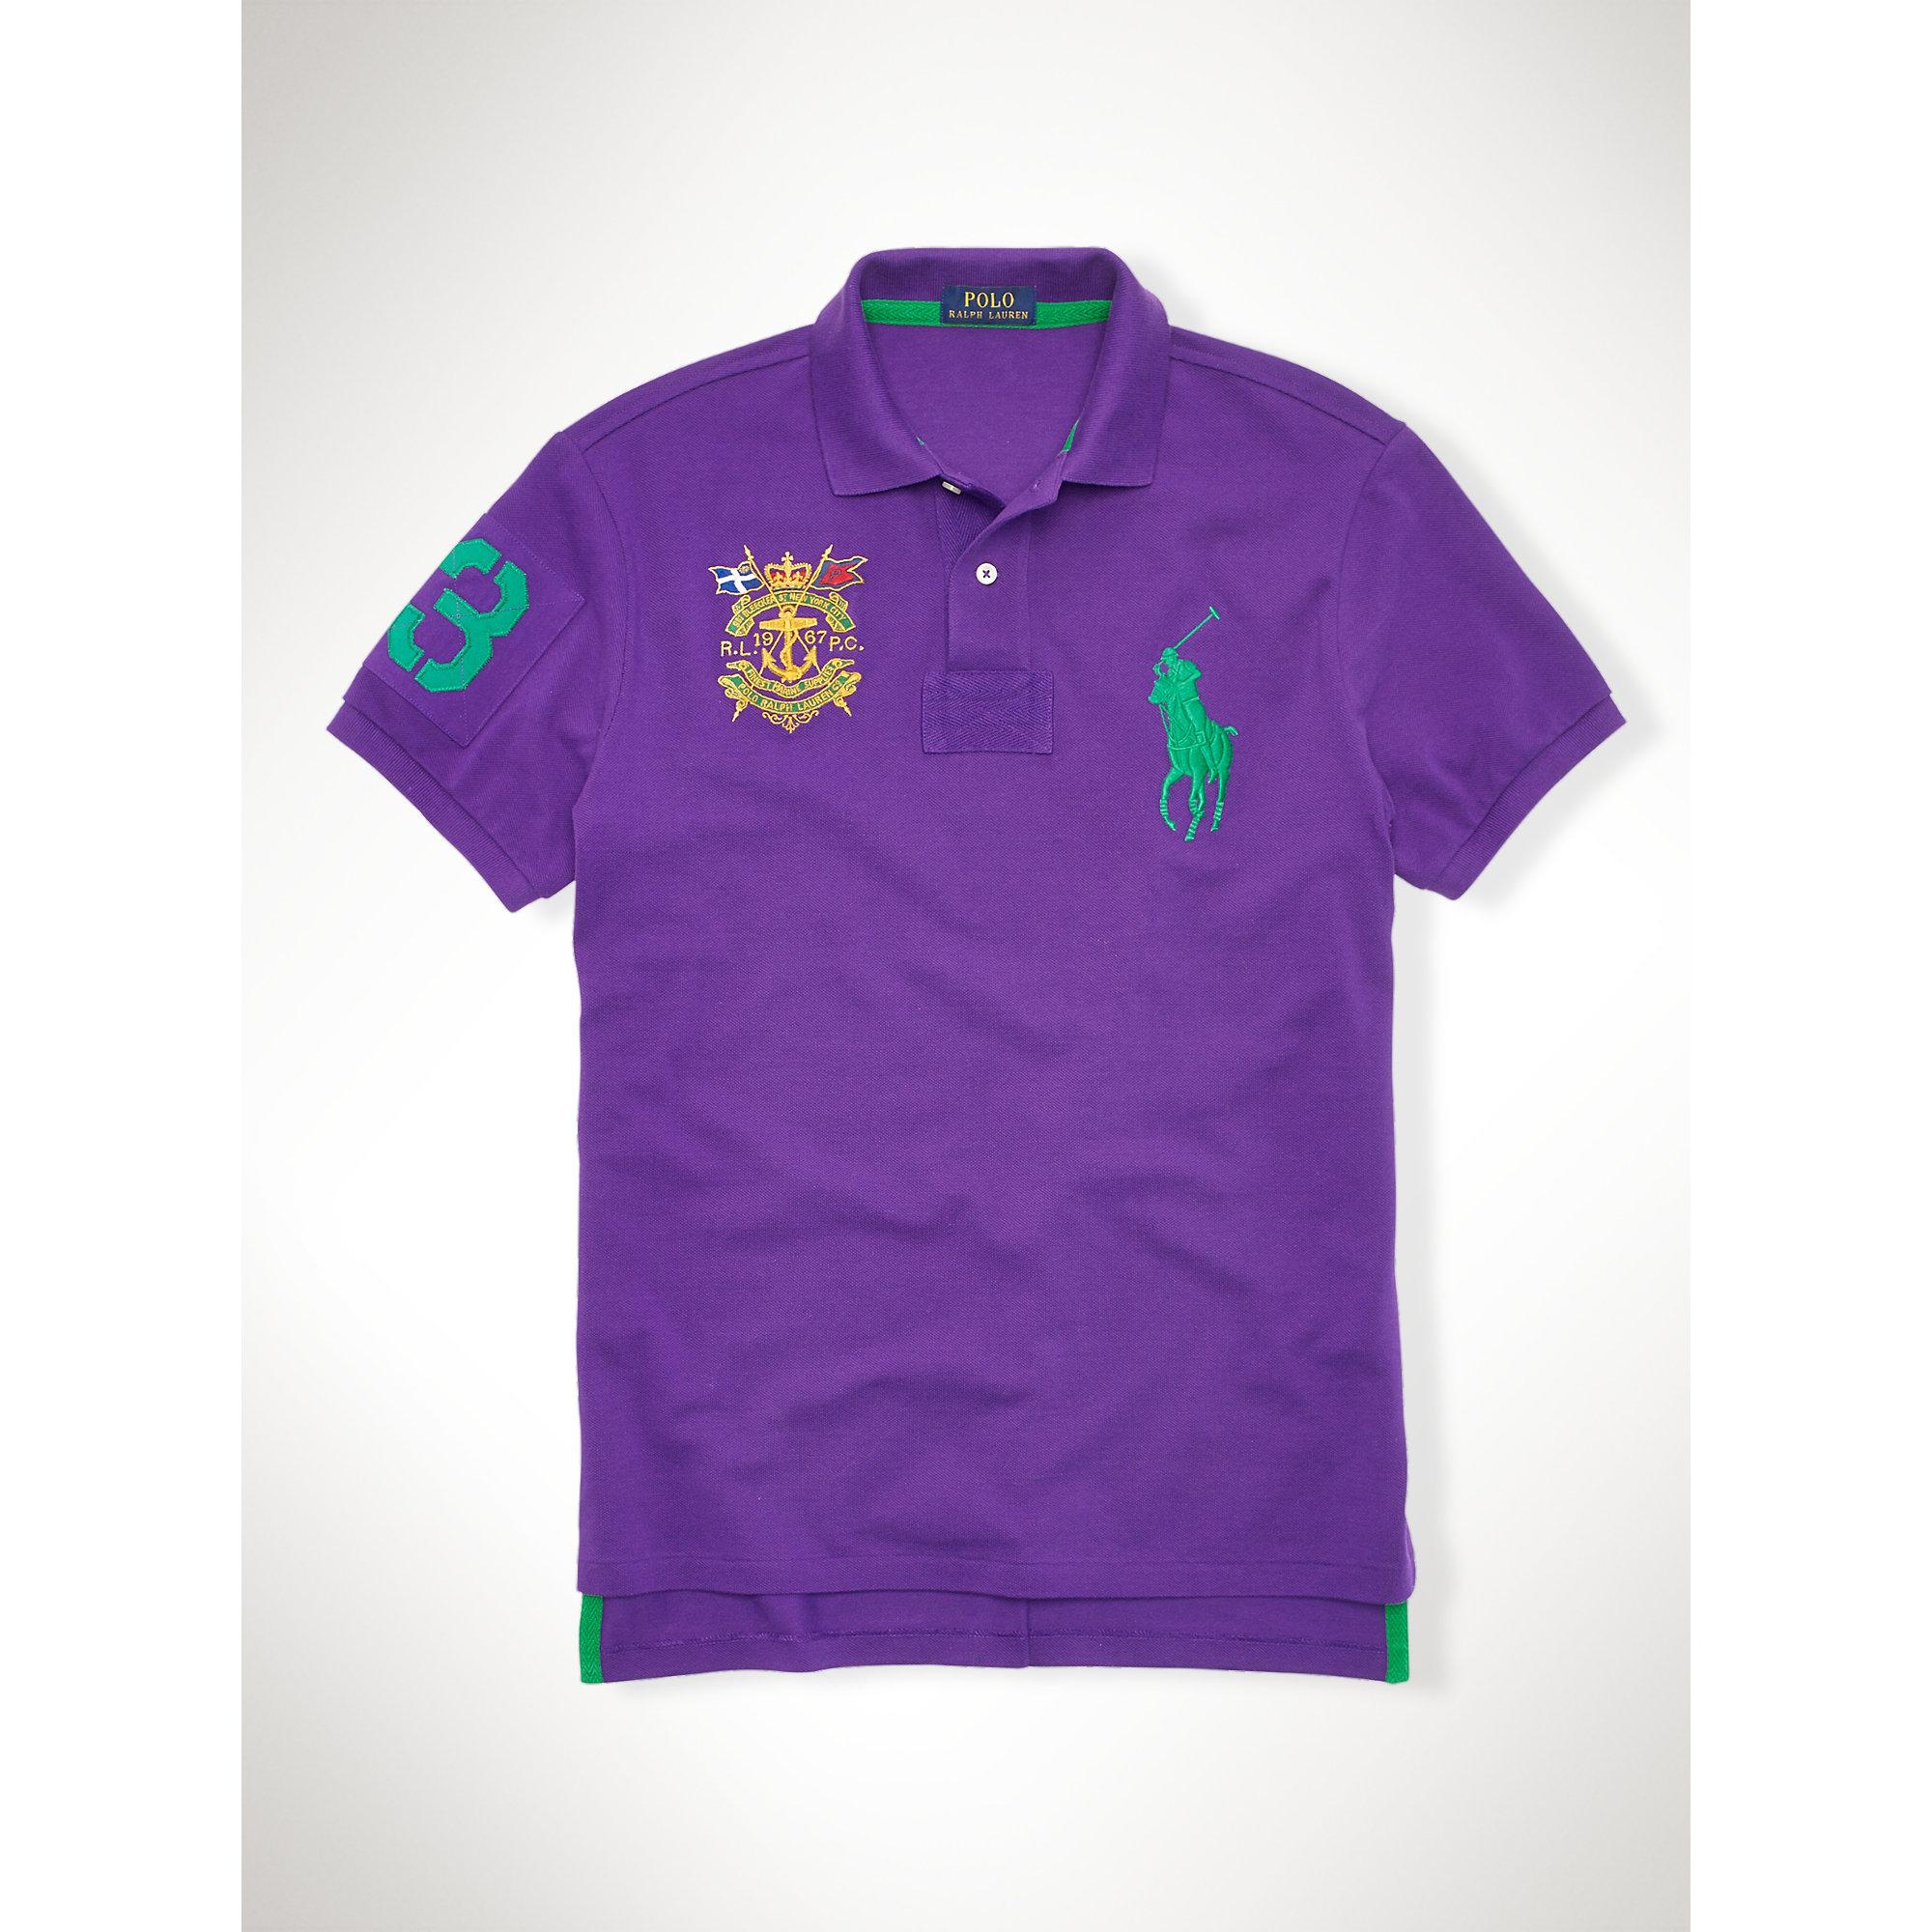 Lyst polo ralph lauren custom fit big pony crest polo in for Black ralph lauren shirt purple horse